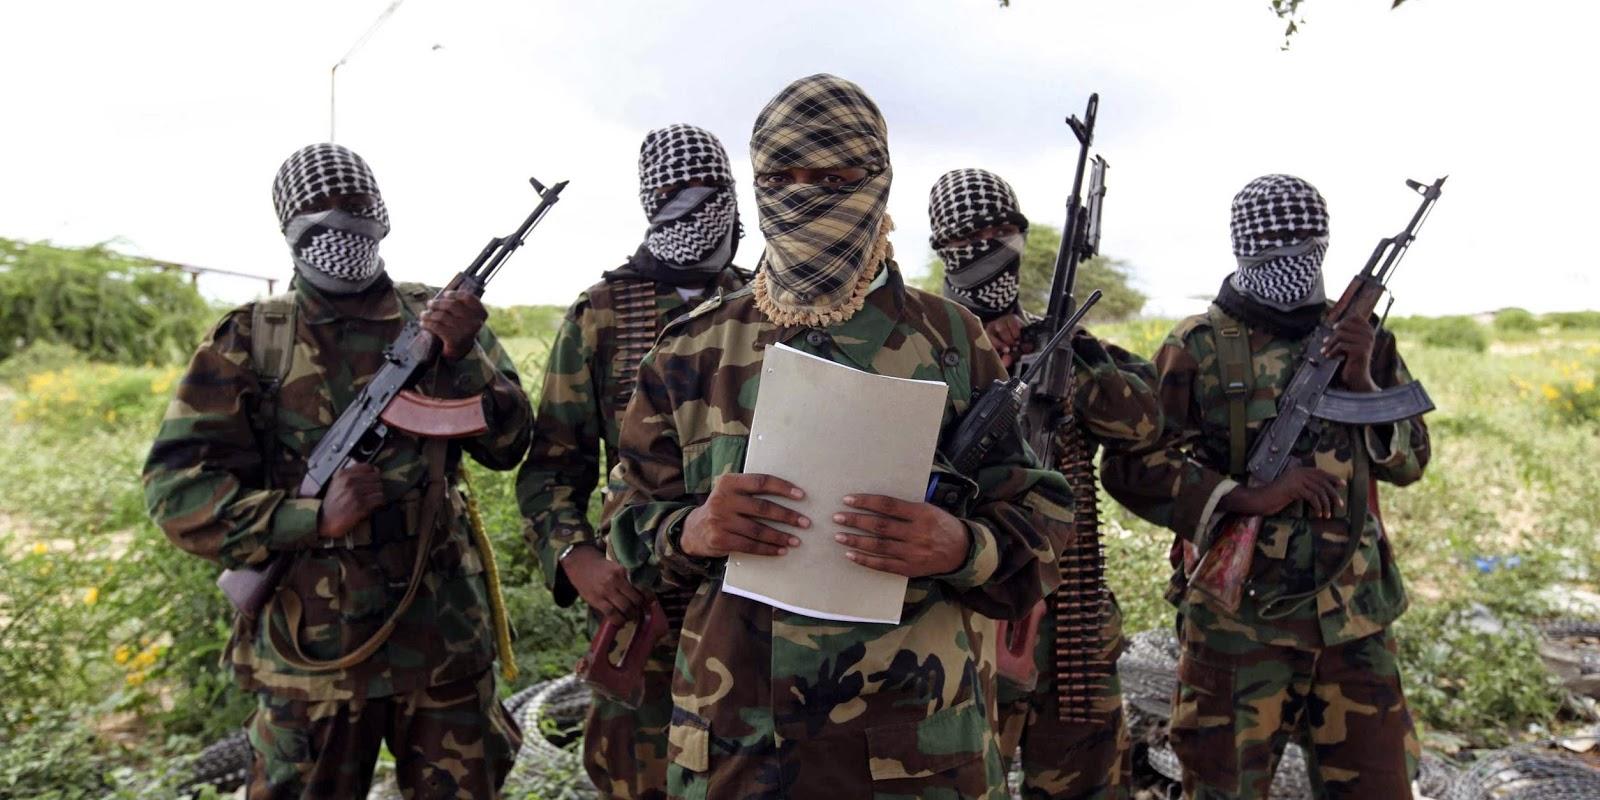 Teroris Rencanakan Seranga ke AS, Inggris, dan Kanada